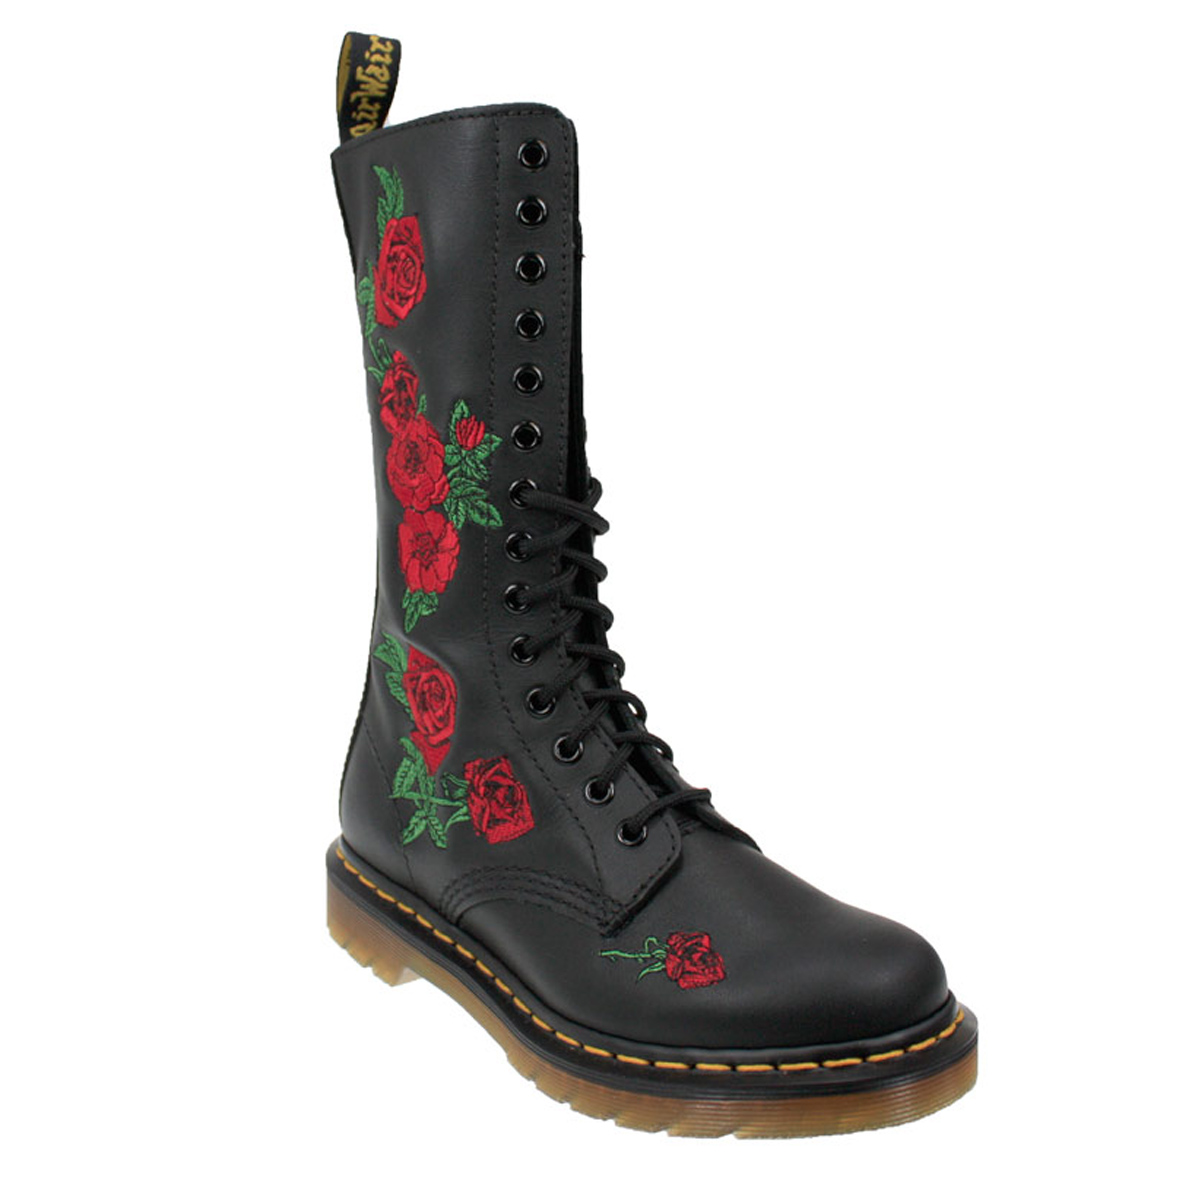 dr martens vonda womens docs black leather mid calf boots. Black Bedroom Furniture Sets. Home Design Ideas